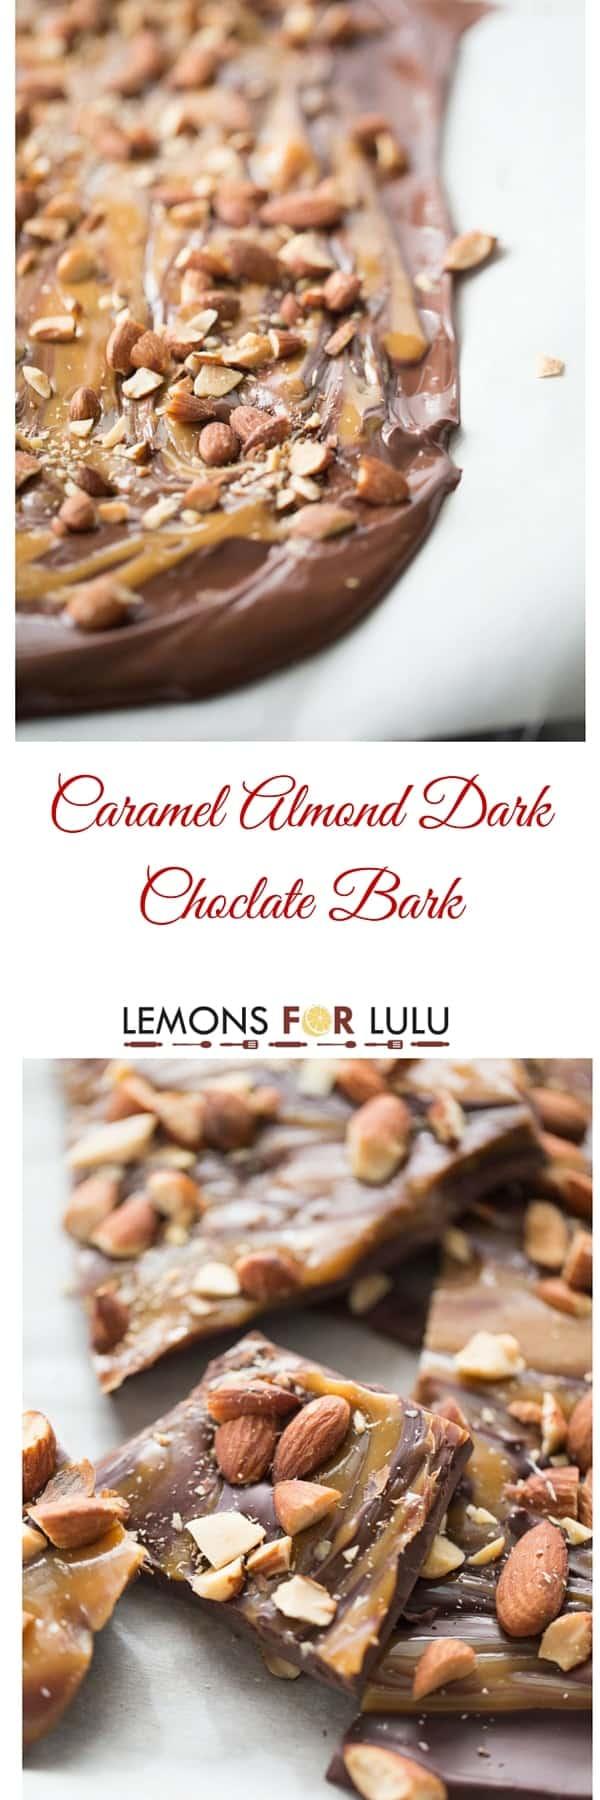 Dark chocolate bark recipe with sweet swirls of caramel and lightly salted almonds! lemonsforlulu.com